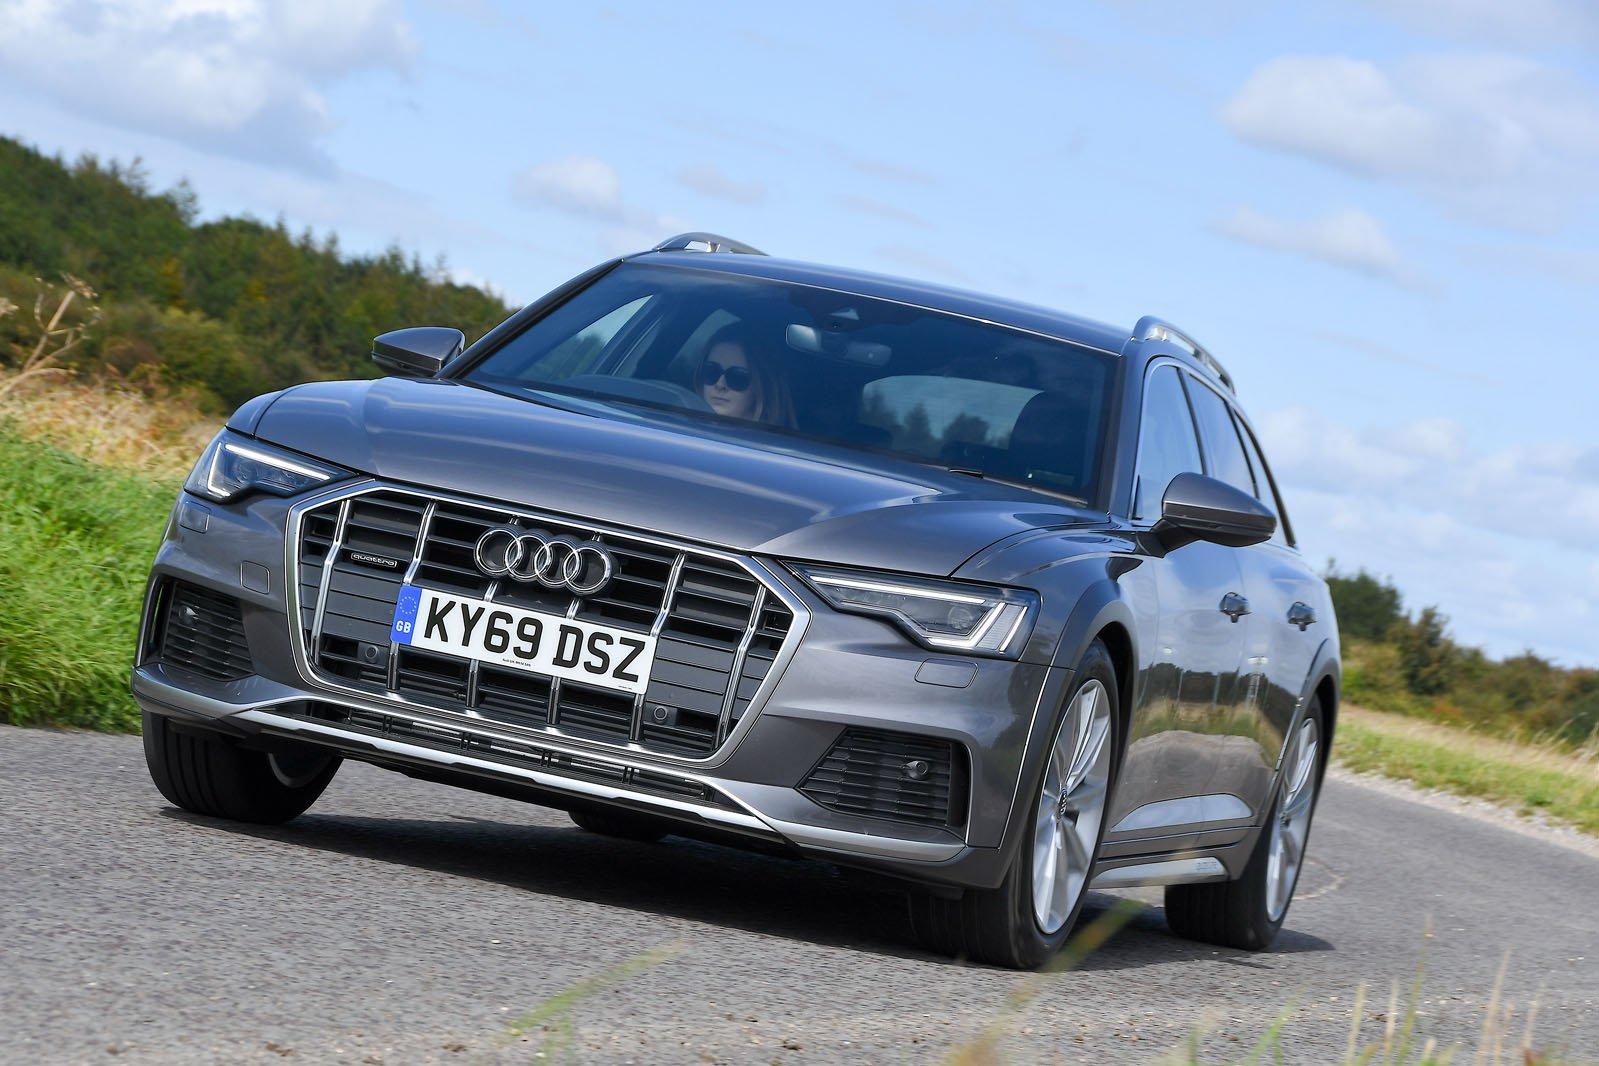 Audi A6 Allroad driving